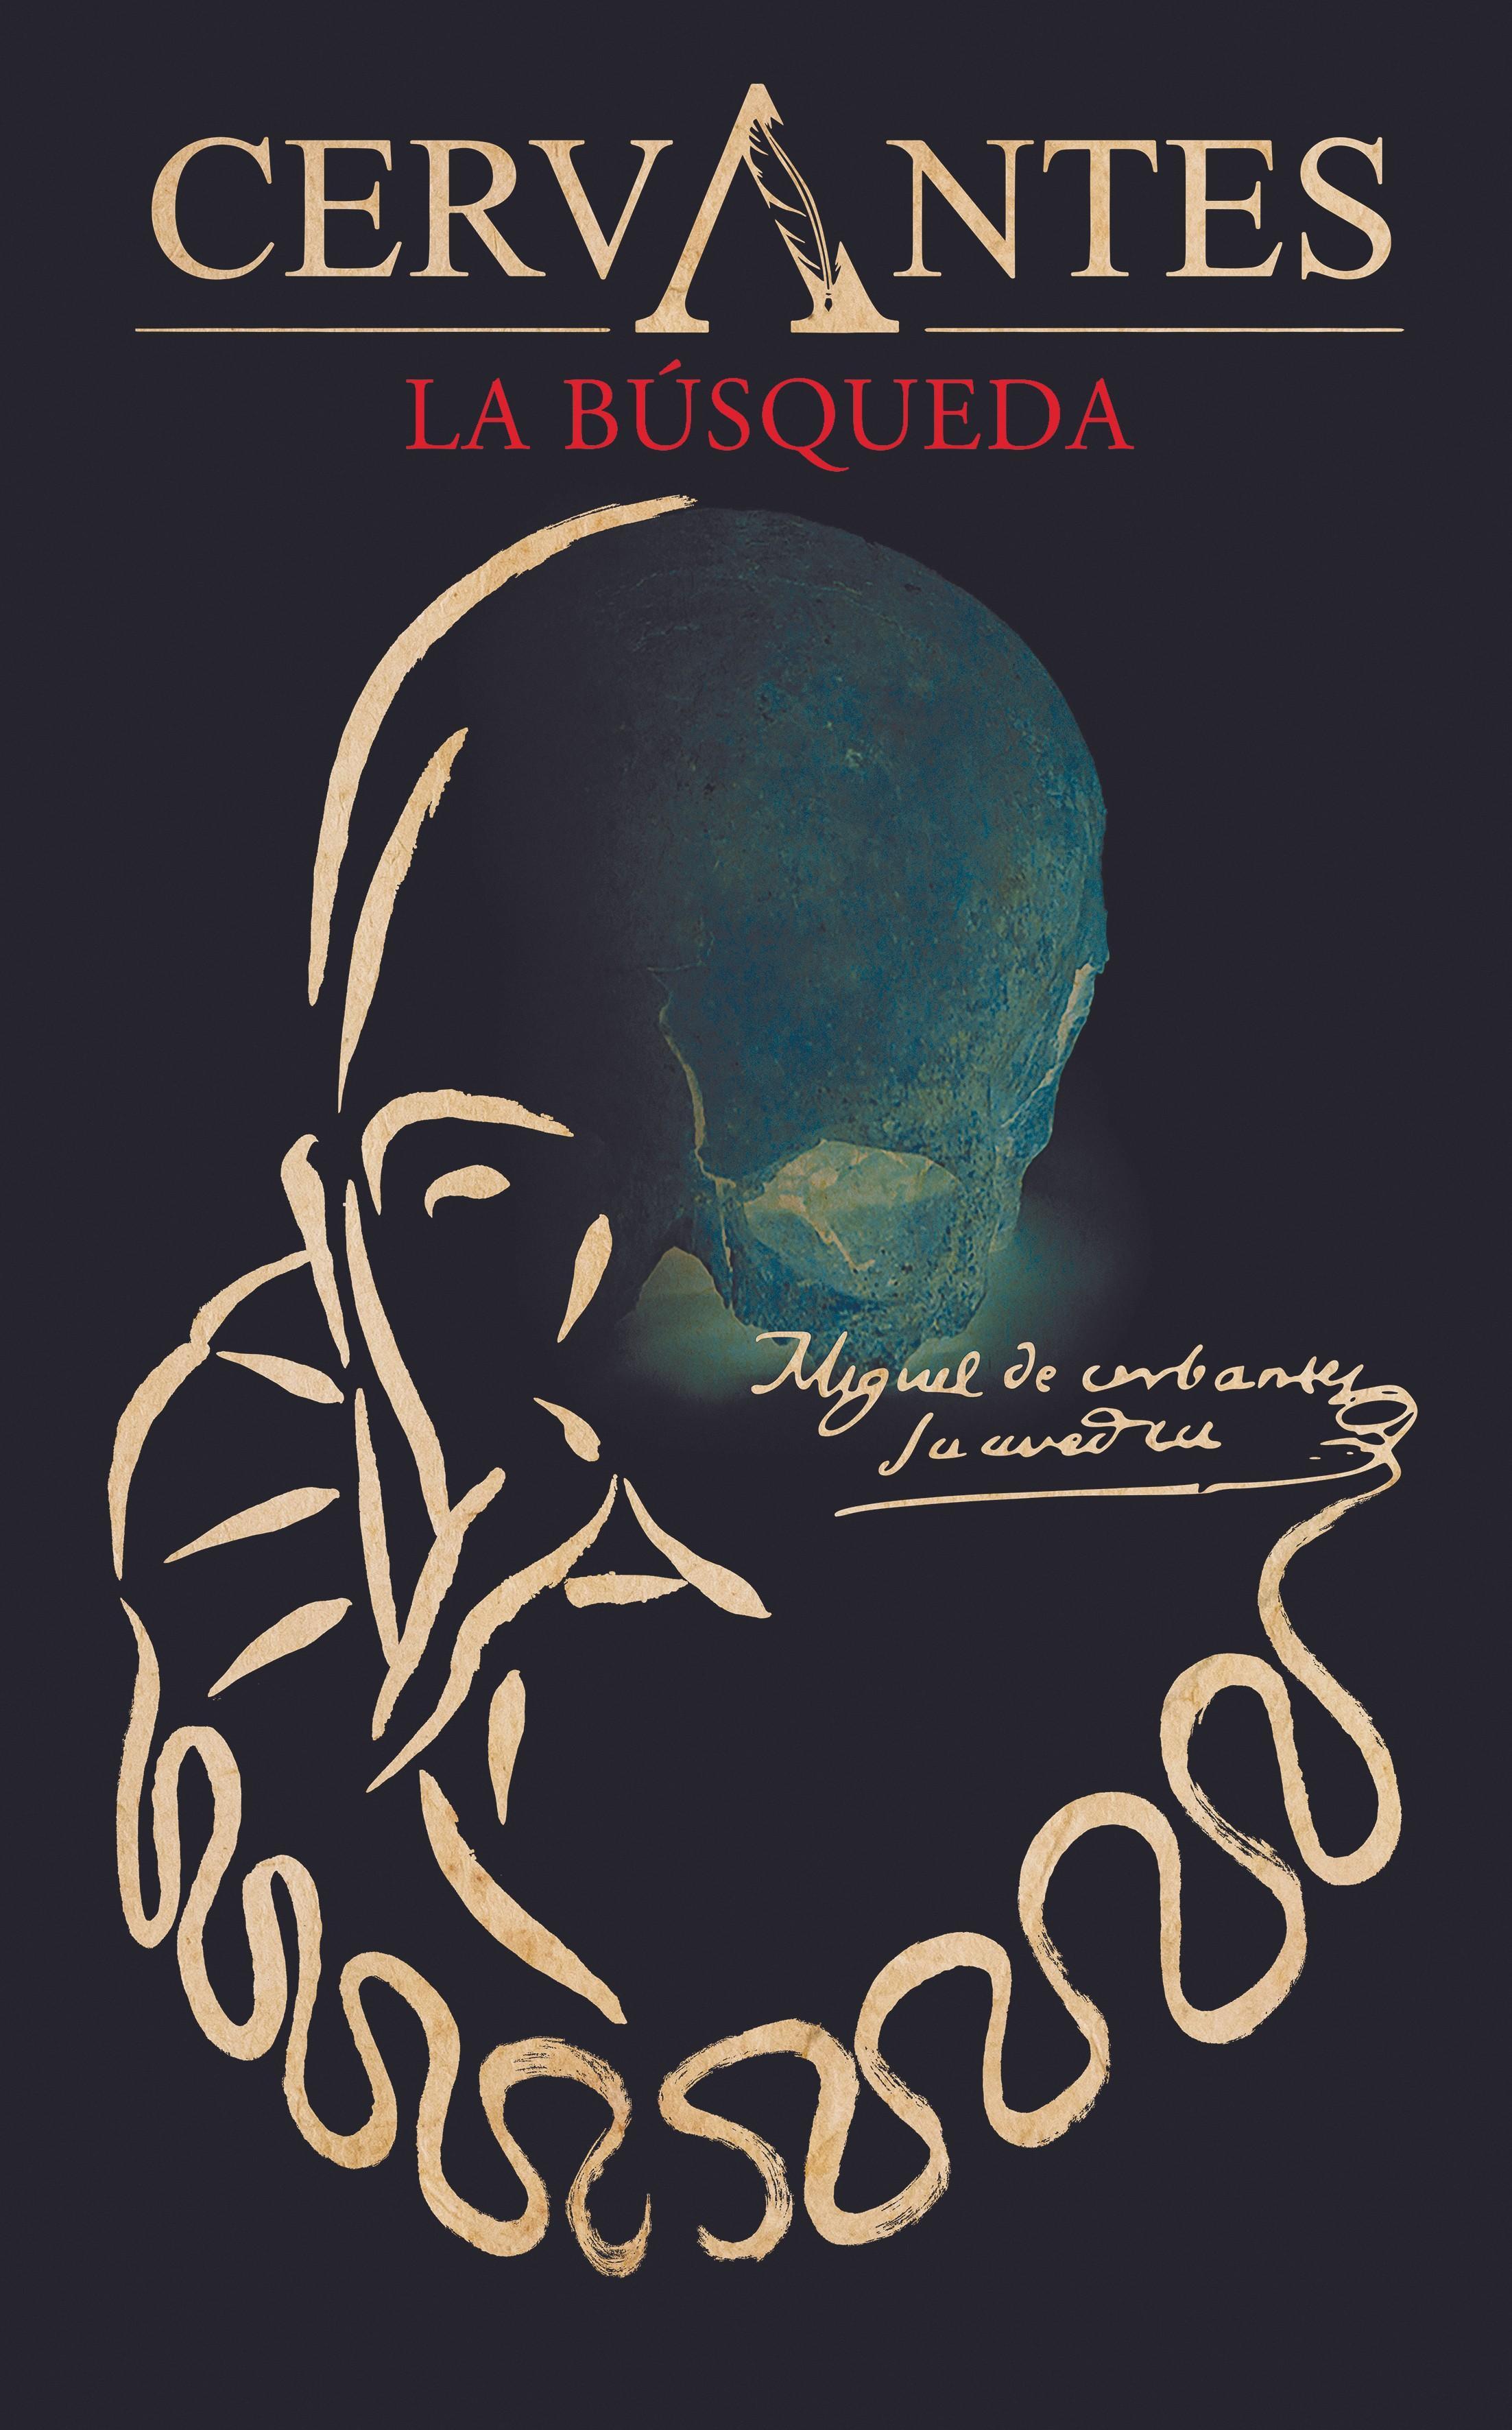 Cartel del documental Cervantes, la búsqueda de Javier Balaguer, 2016.